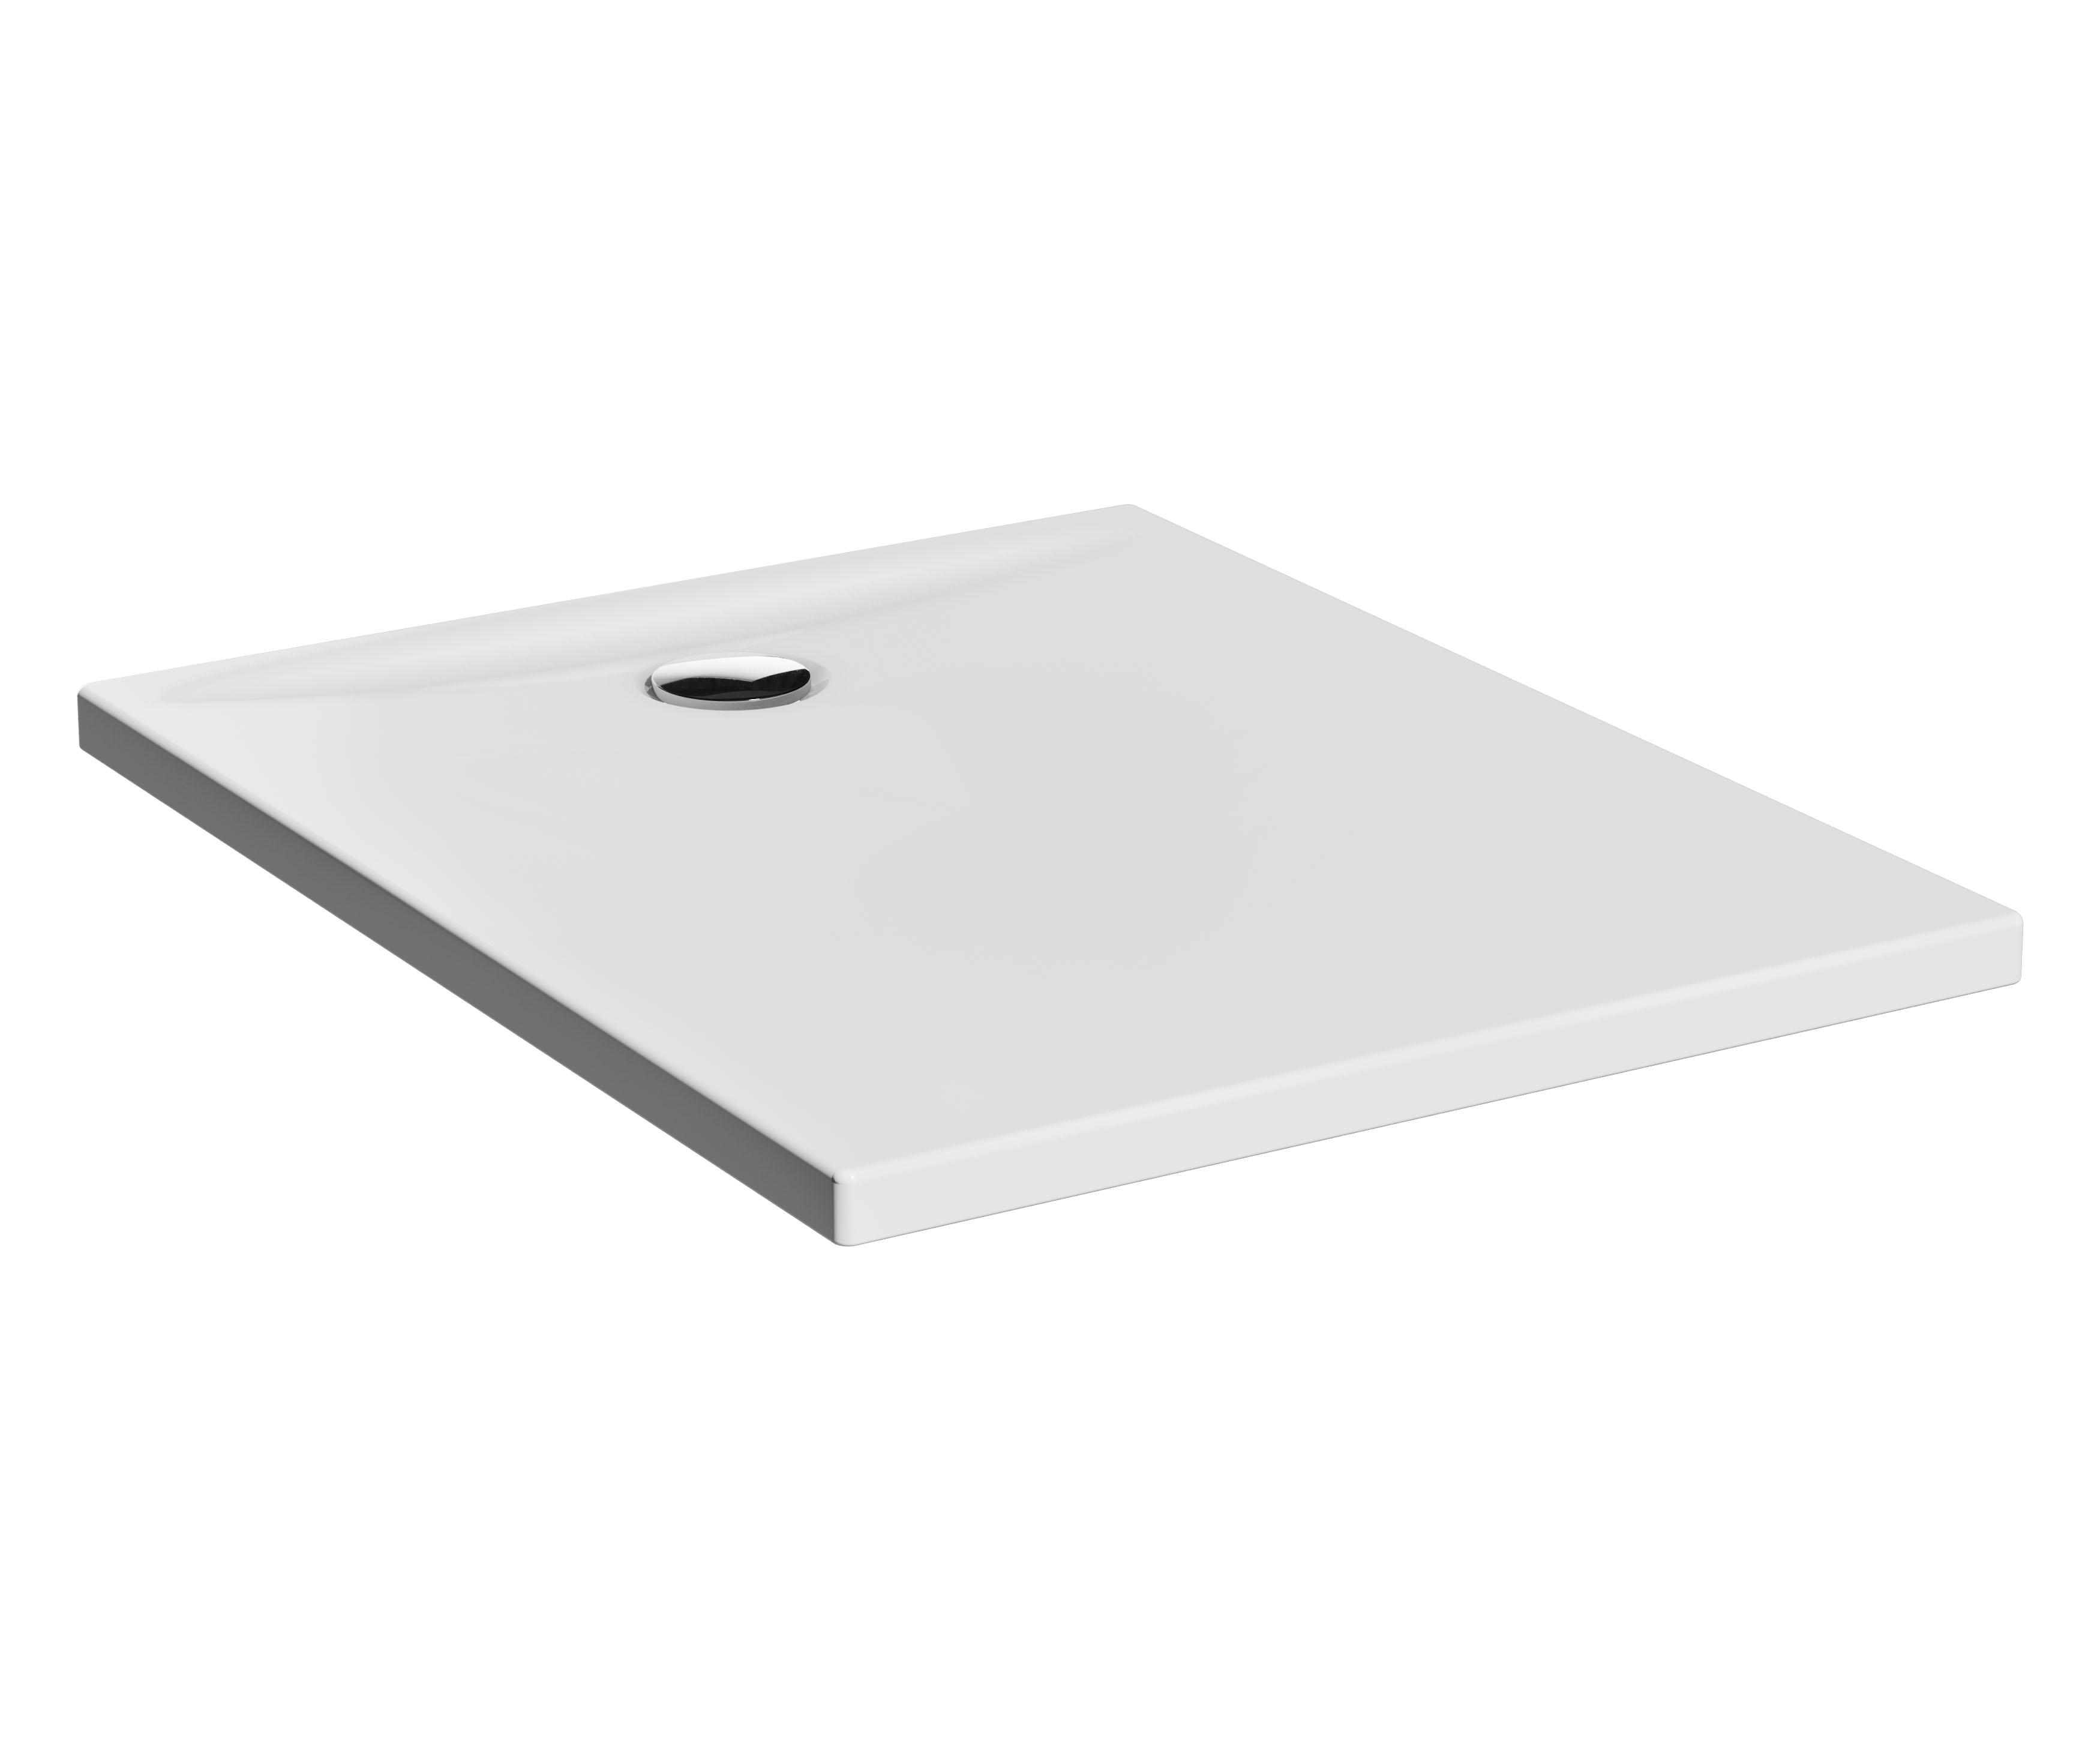 Lagoon receveur ultra plat en céramique, 100  x  80 cm, blanc